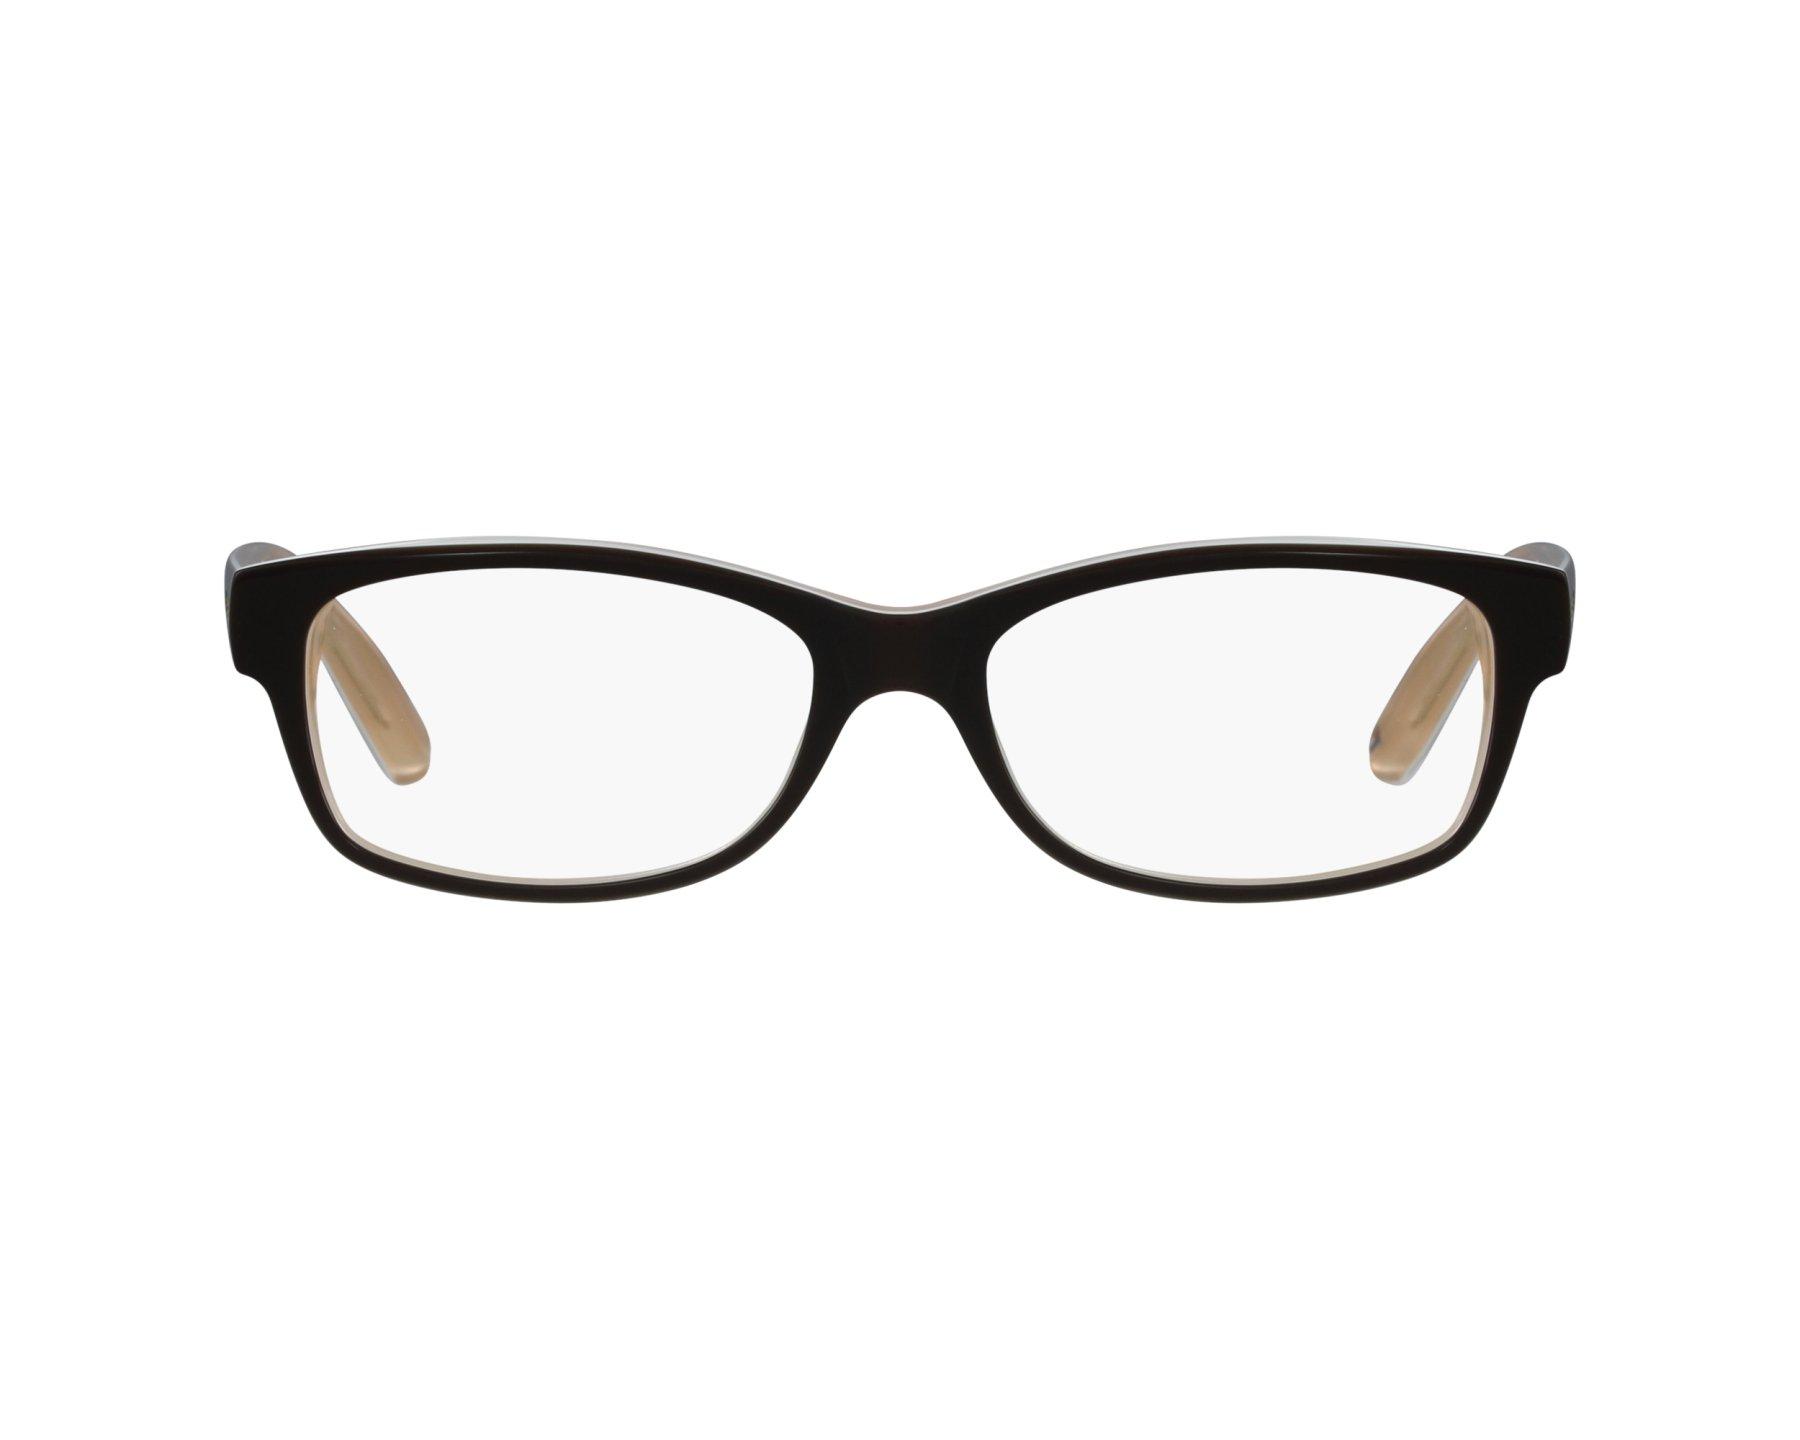 055b21b3758 eyeglasses Tommy Hilfiger TH-1018 GYB 52-16 Brown Beige profile view